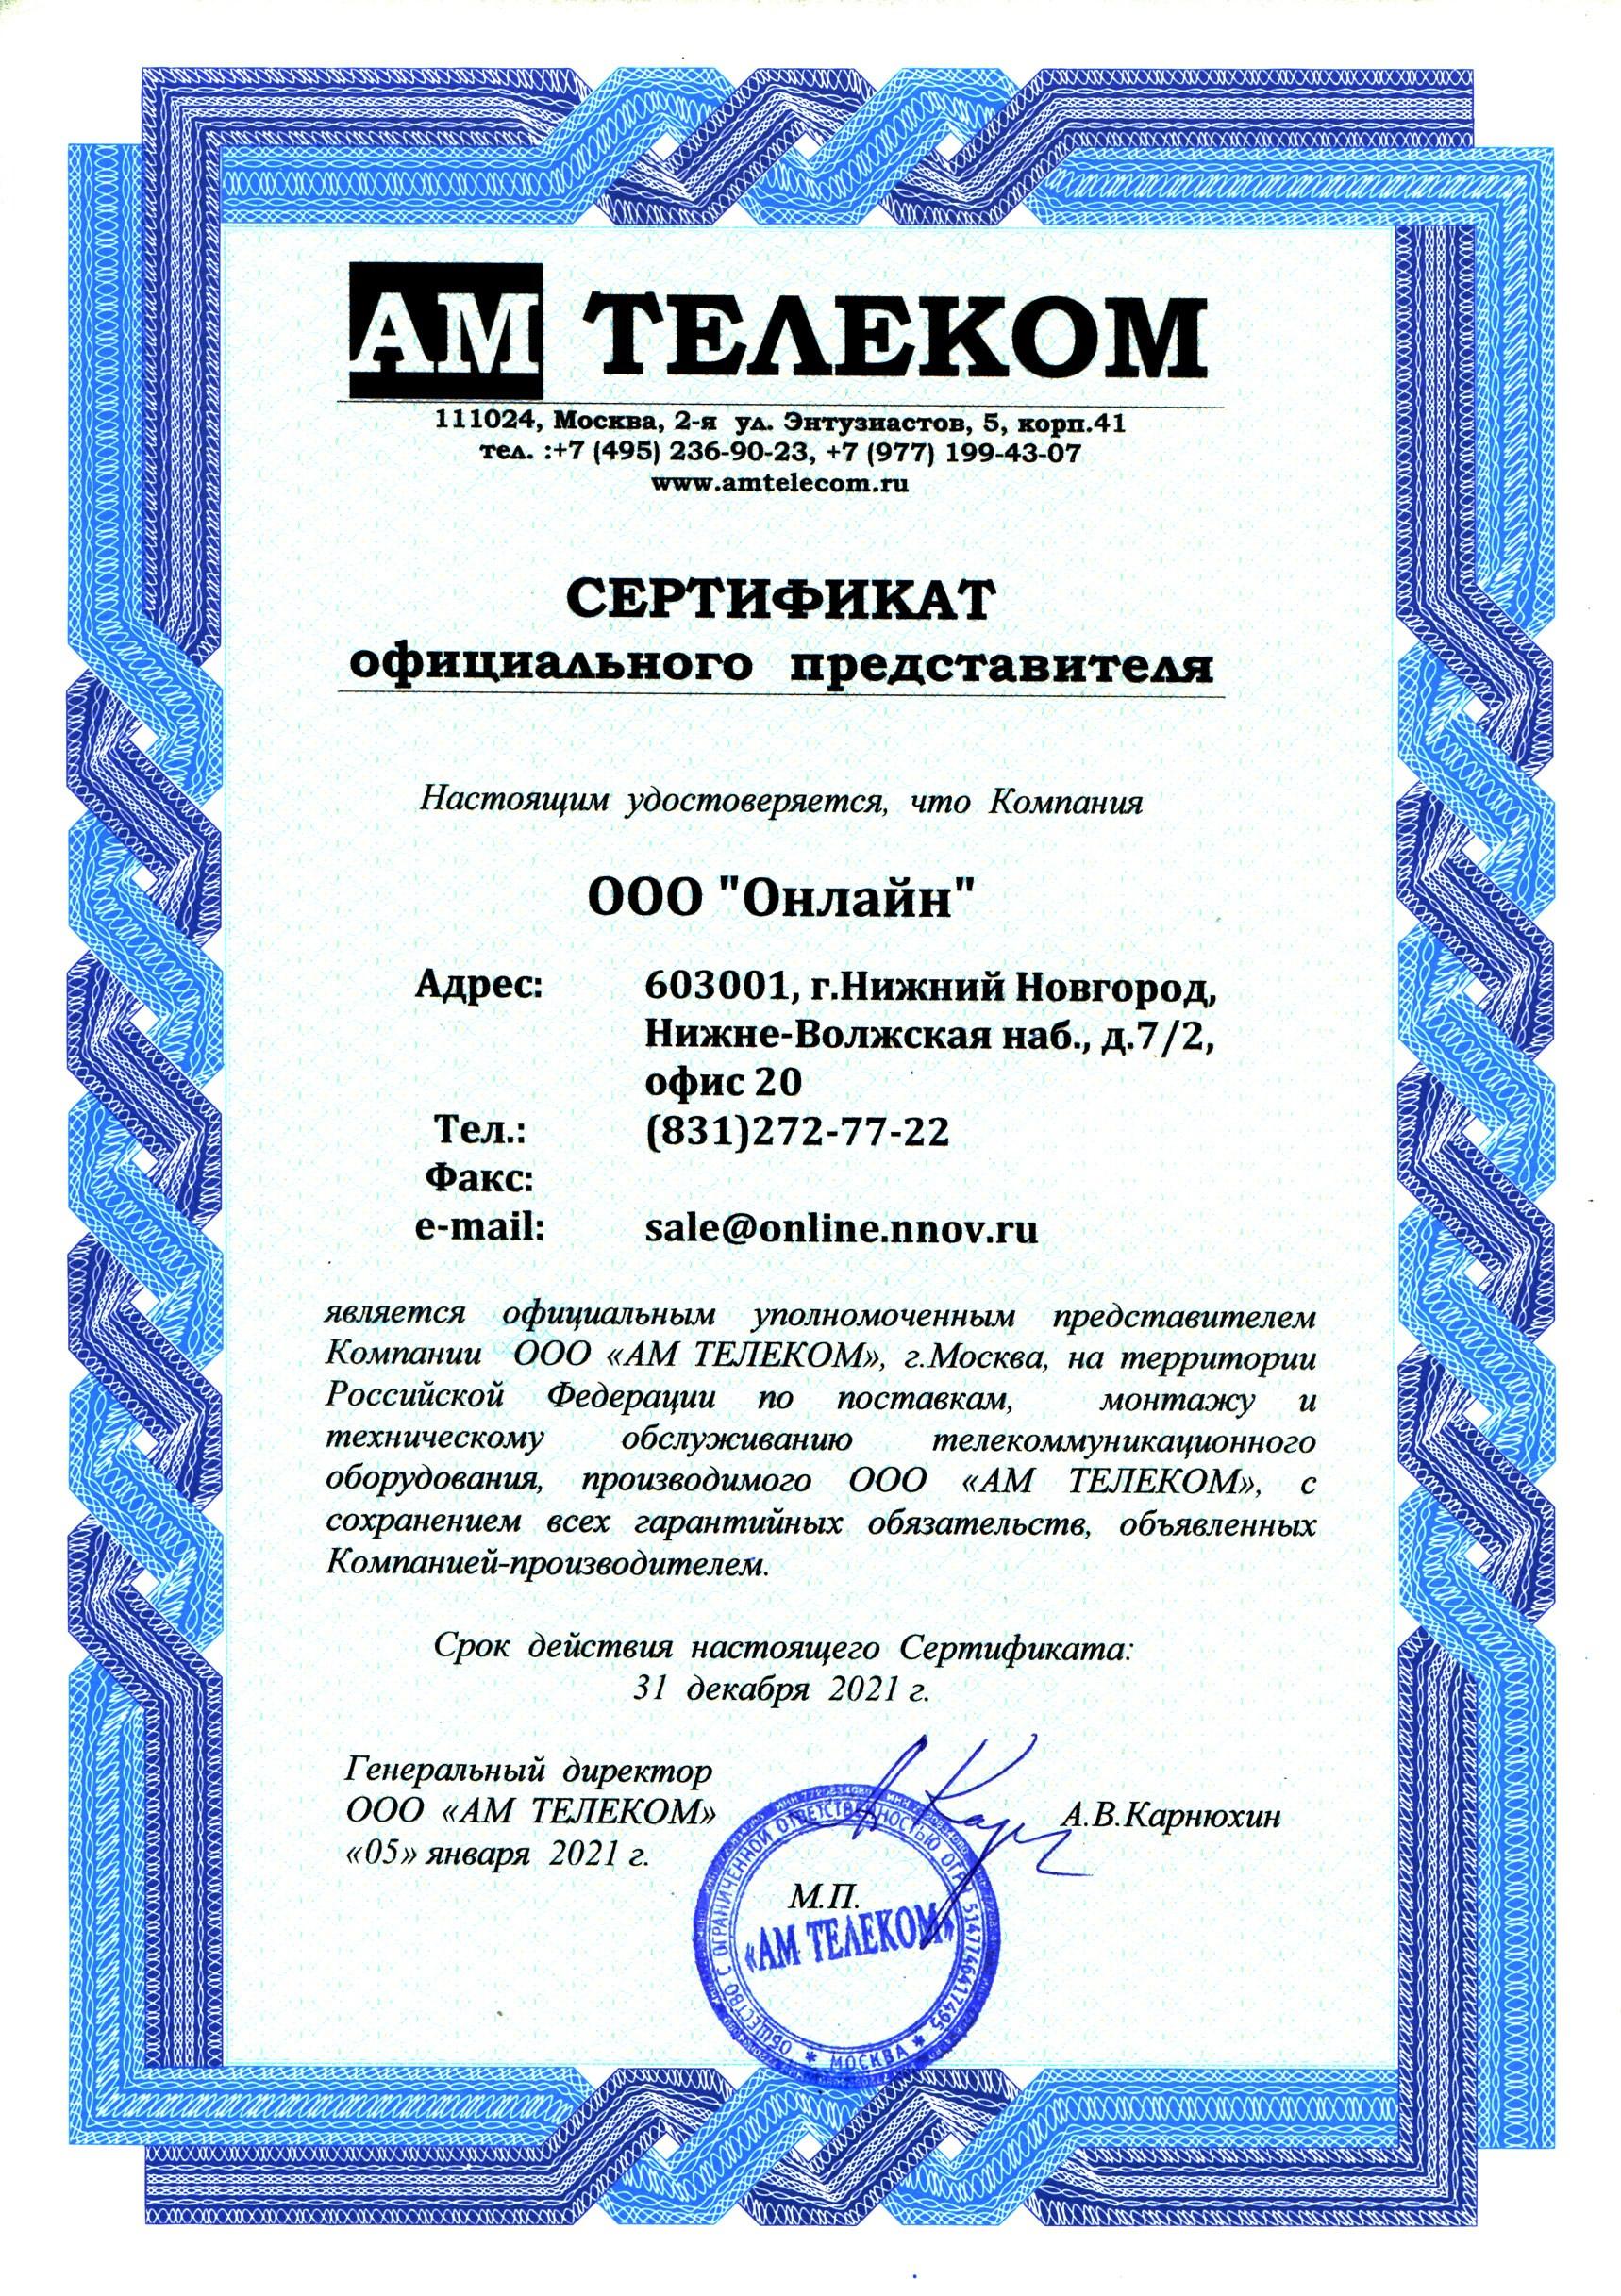 Сертификат АМ ТЕЛЕКОМ 2021